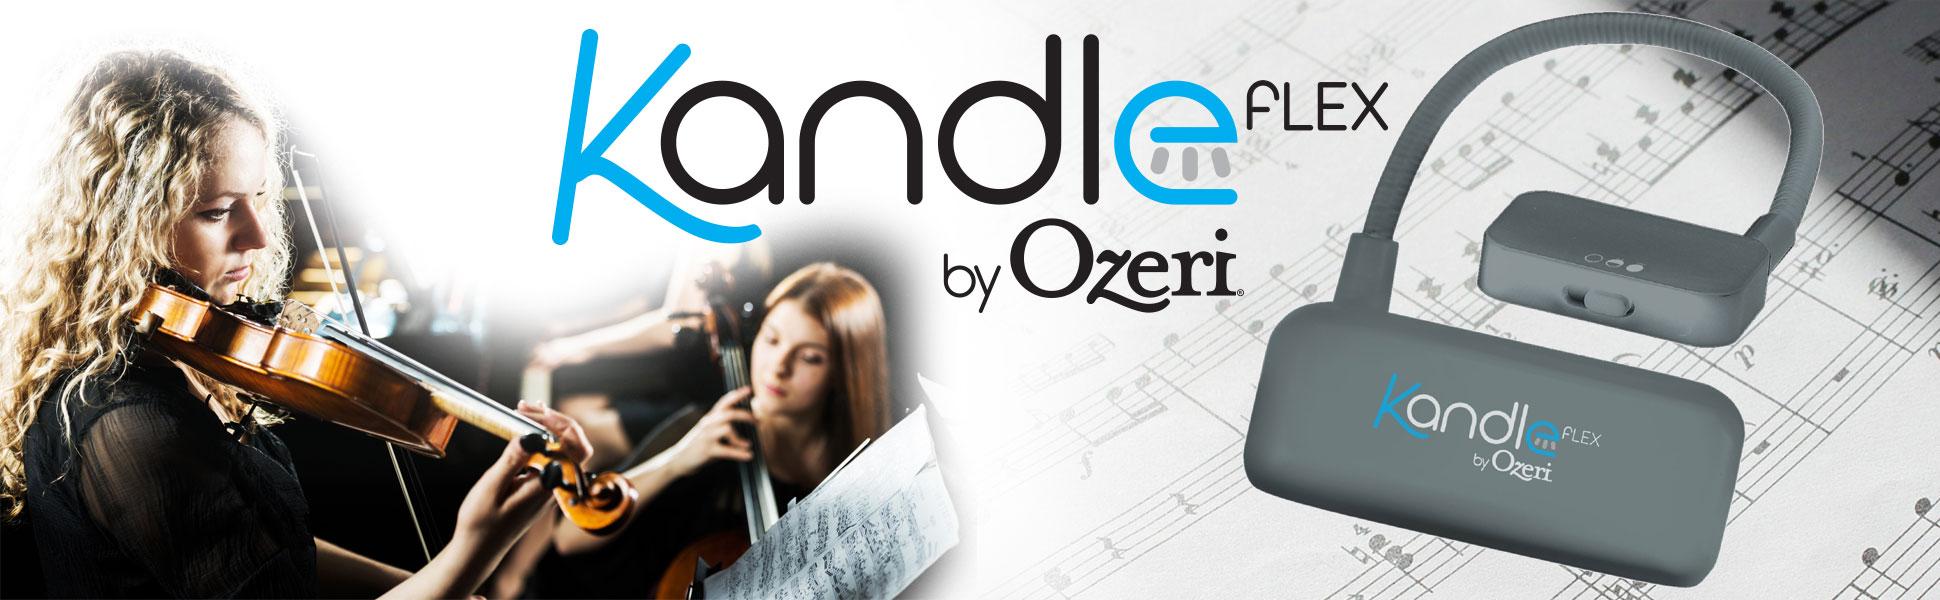 Kandle by Ozeri Flex